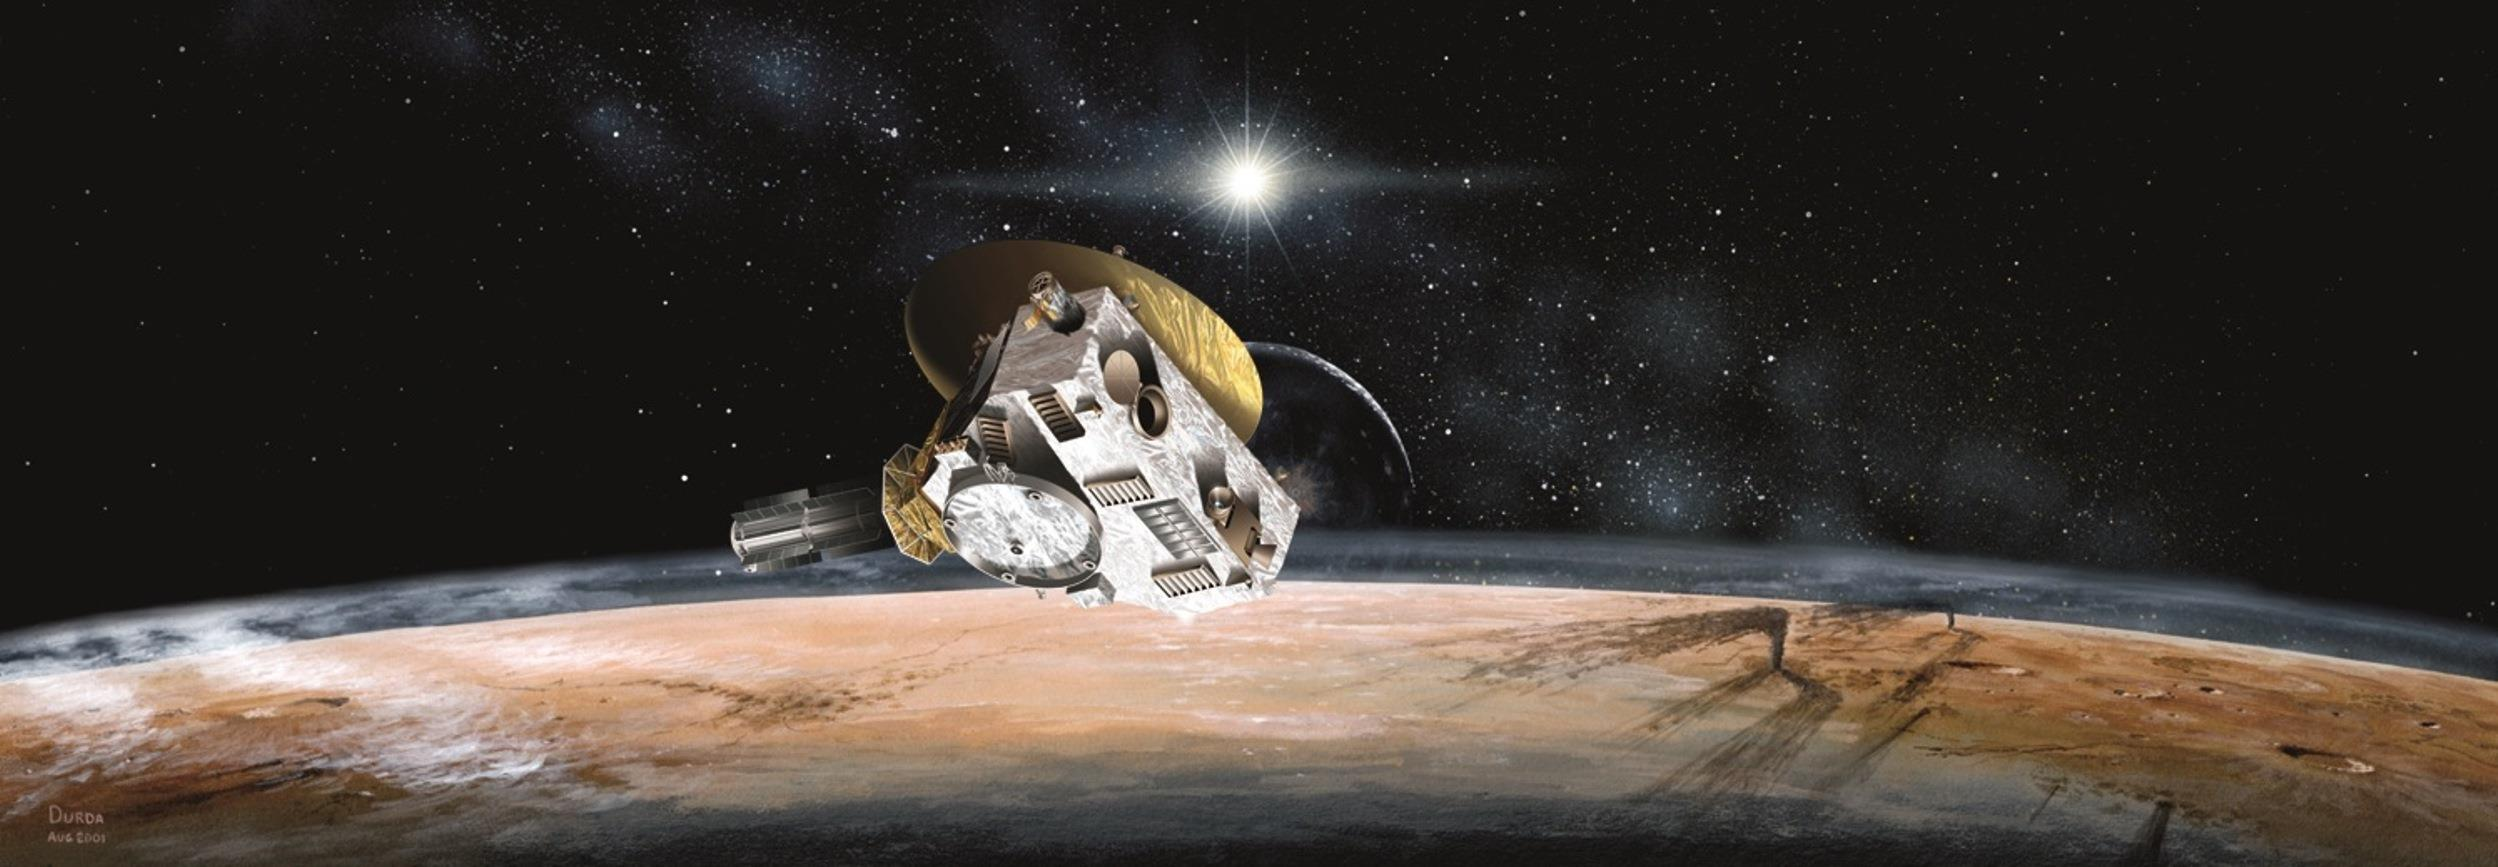 New Horizons Team Responds to Spacecraft Anomaly | NASA